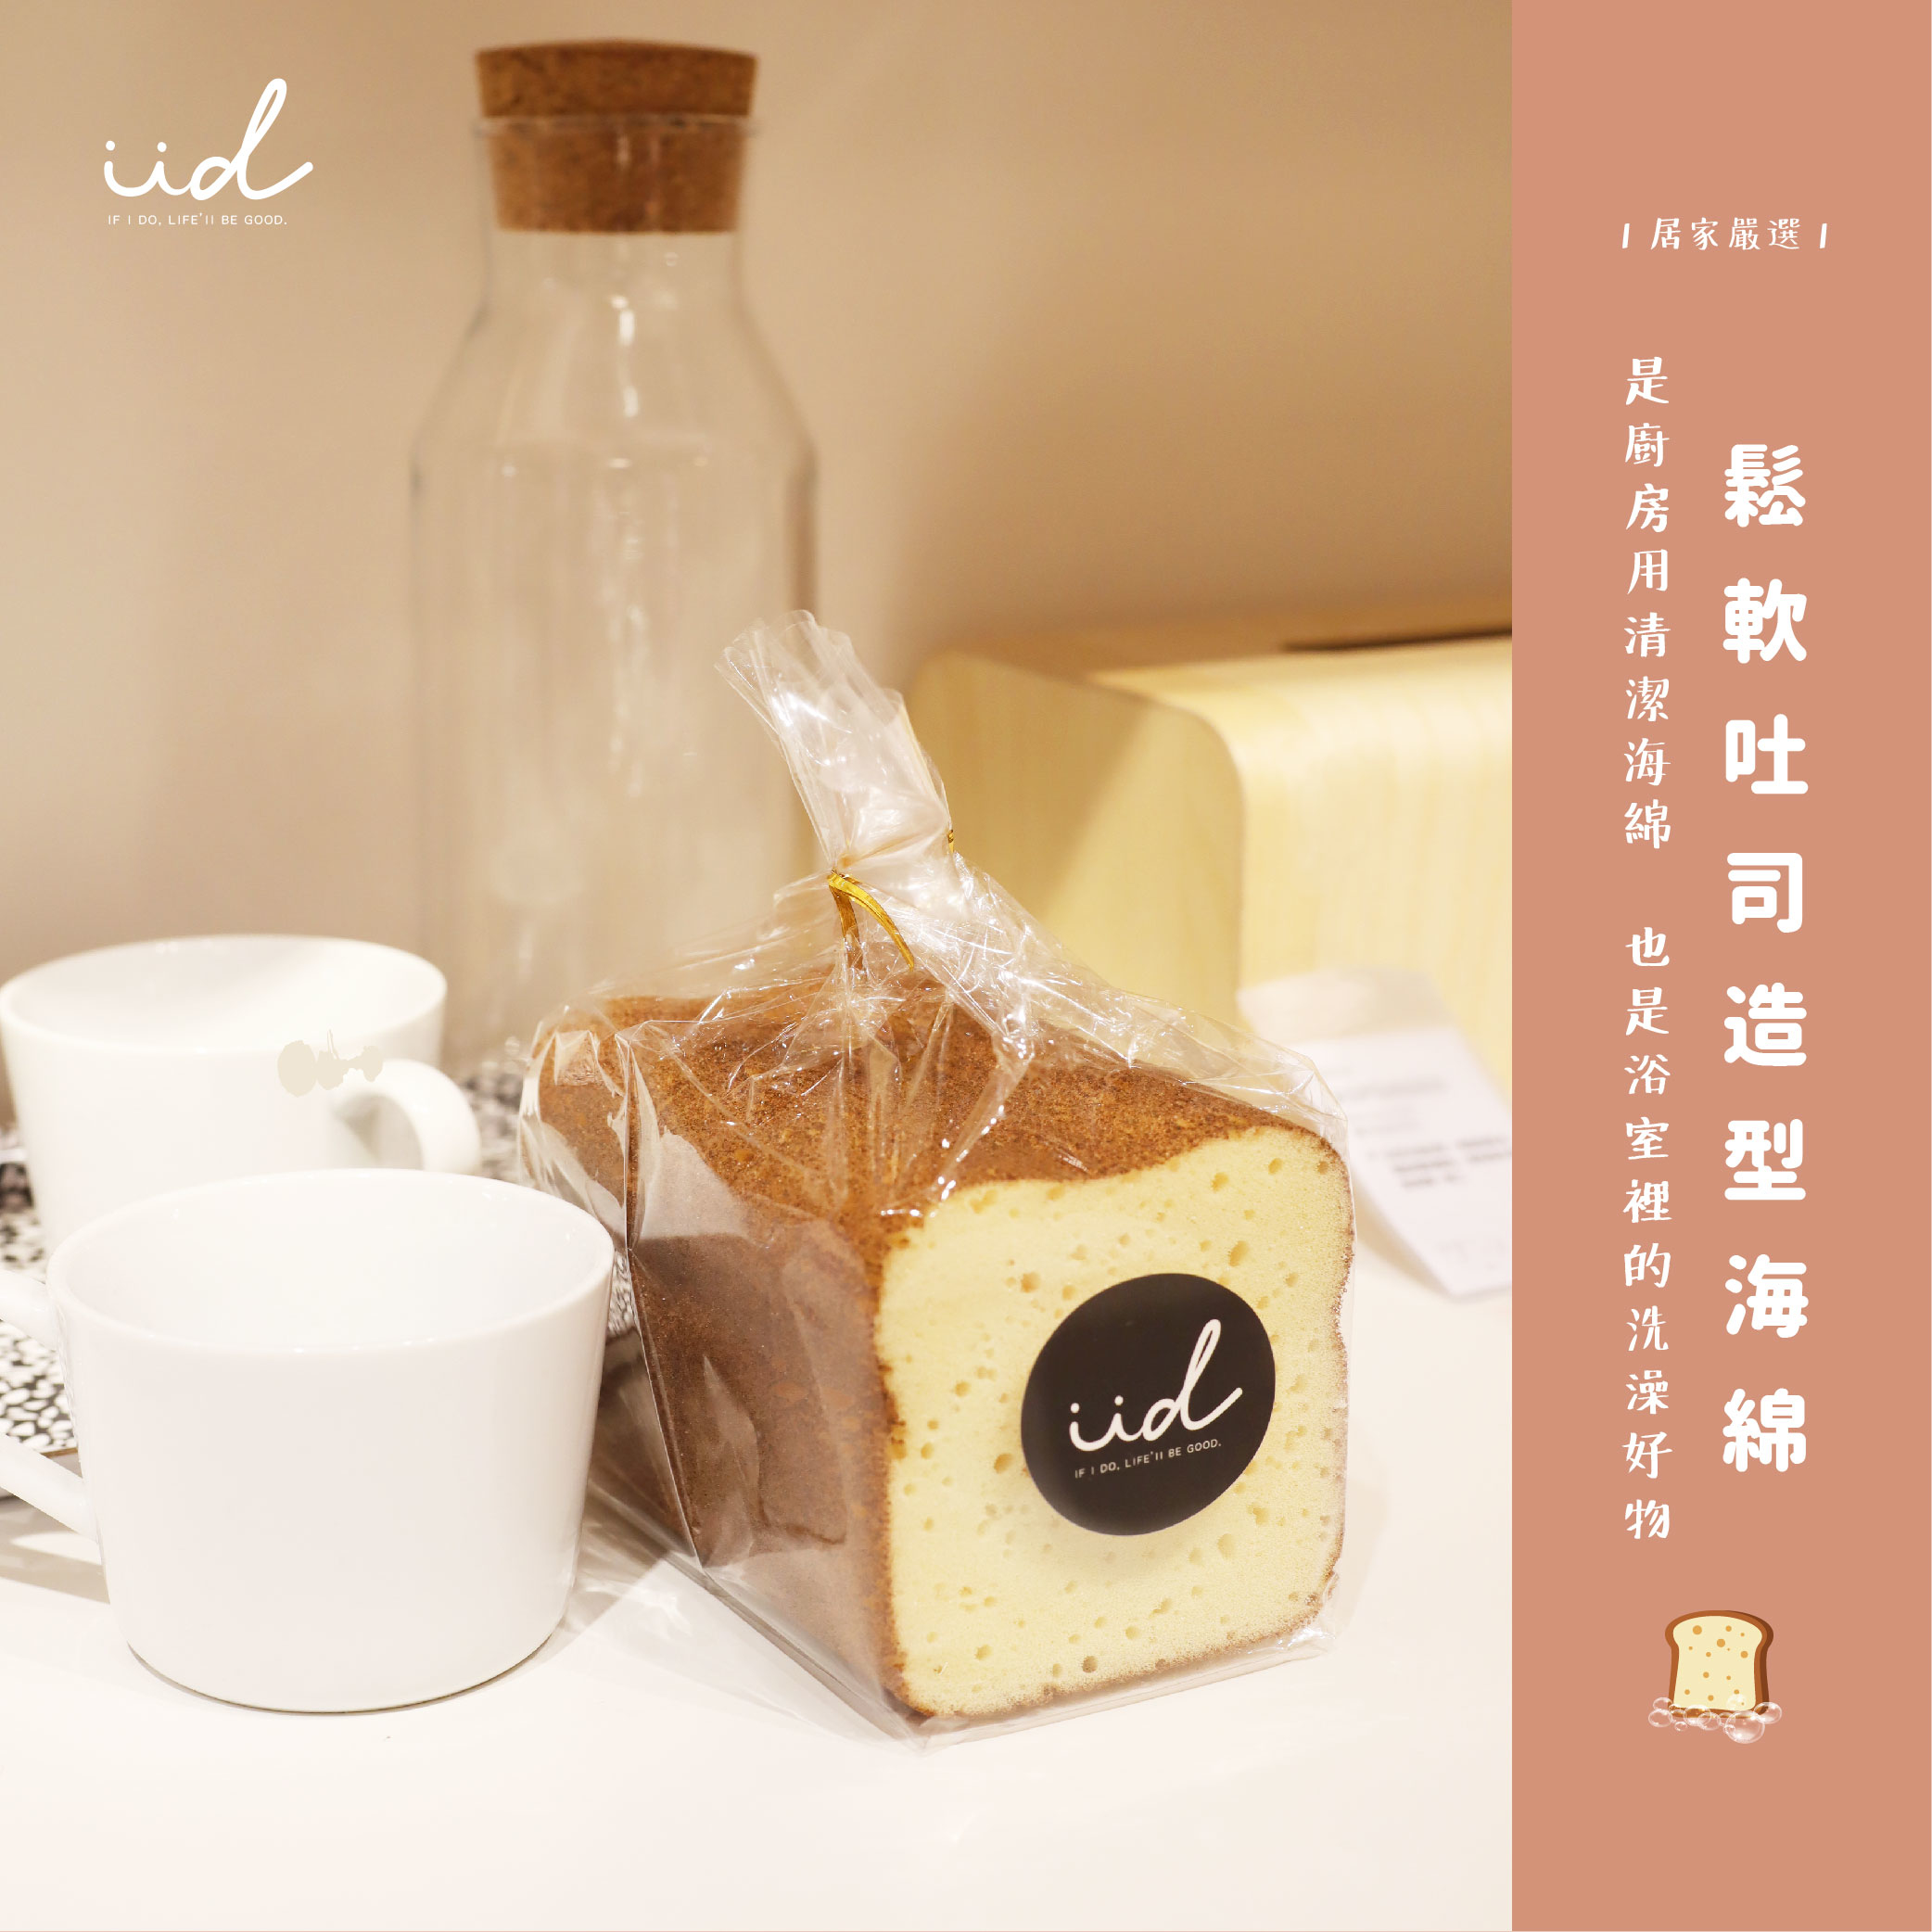 IFIDO居家選物-吐司造型海綿